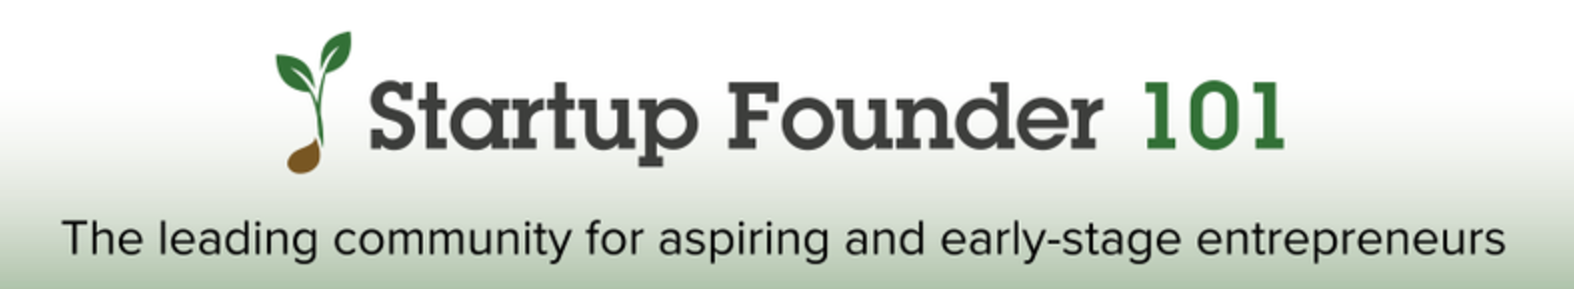 https://www.meetup.com/Stockholm-Startup-Founder-101/